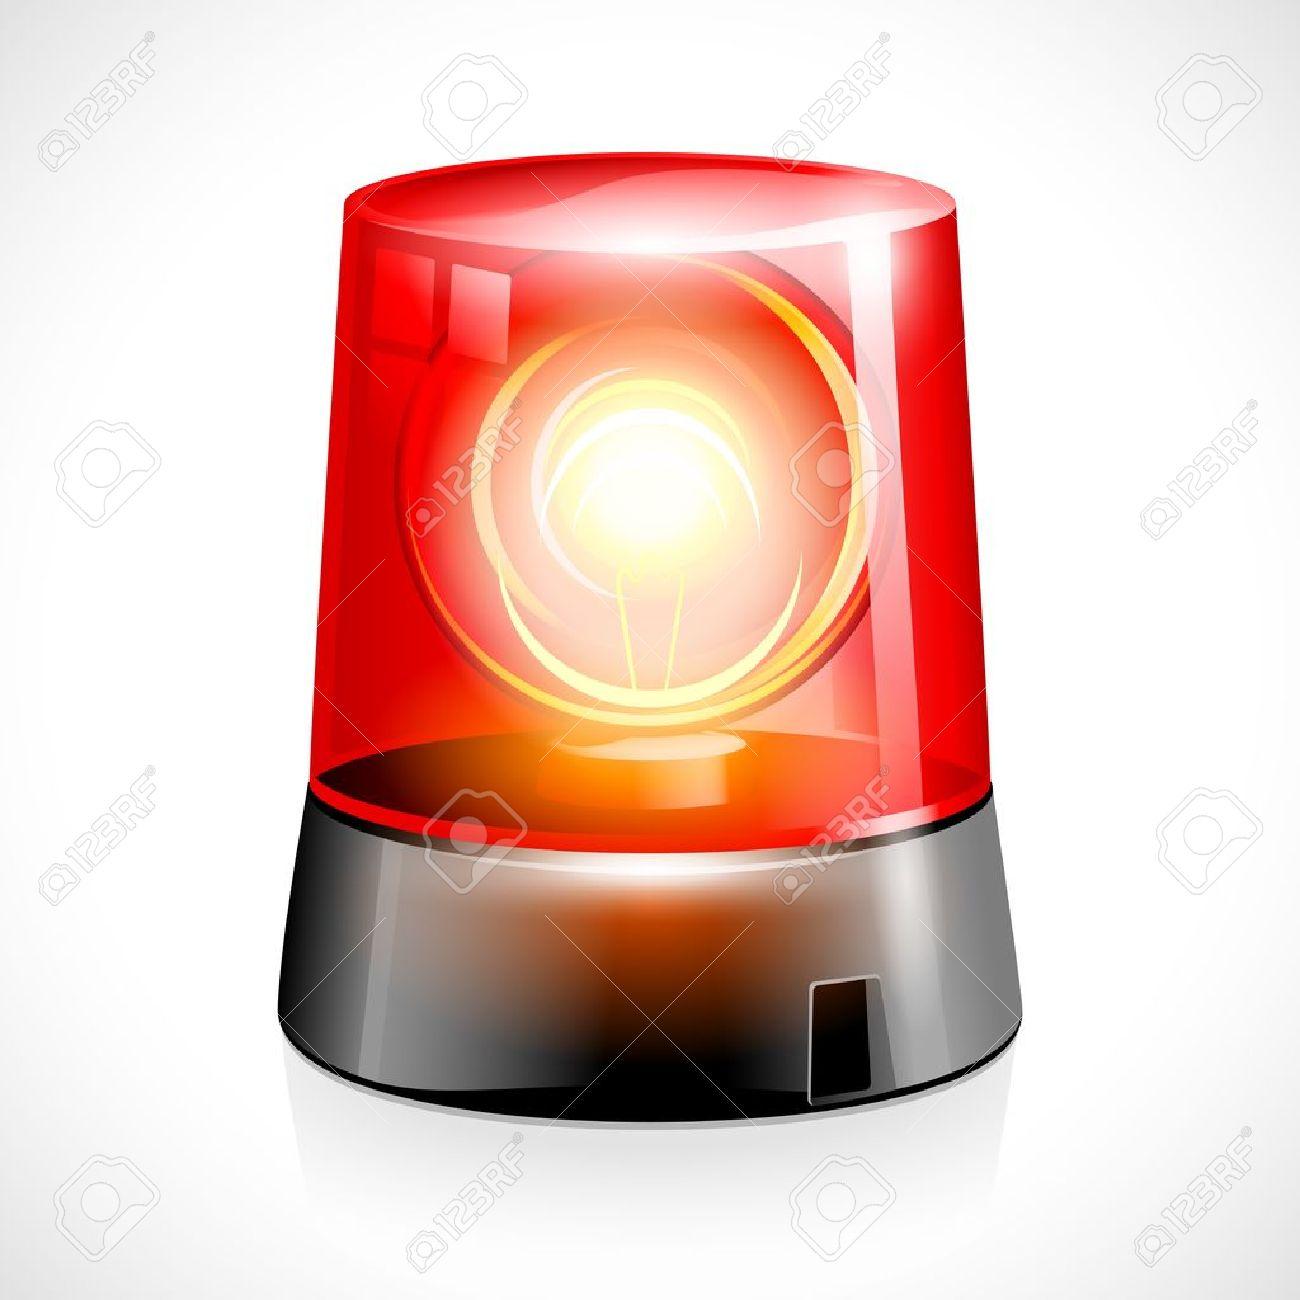 Flashing Red Light >> Vector Illustration Of Red Flashing Emergency Light